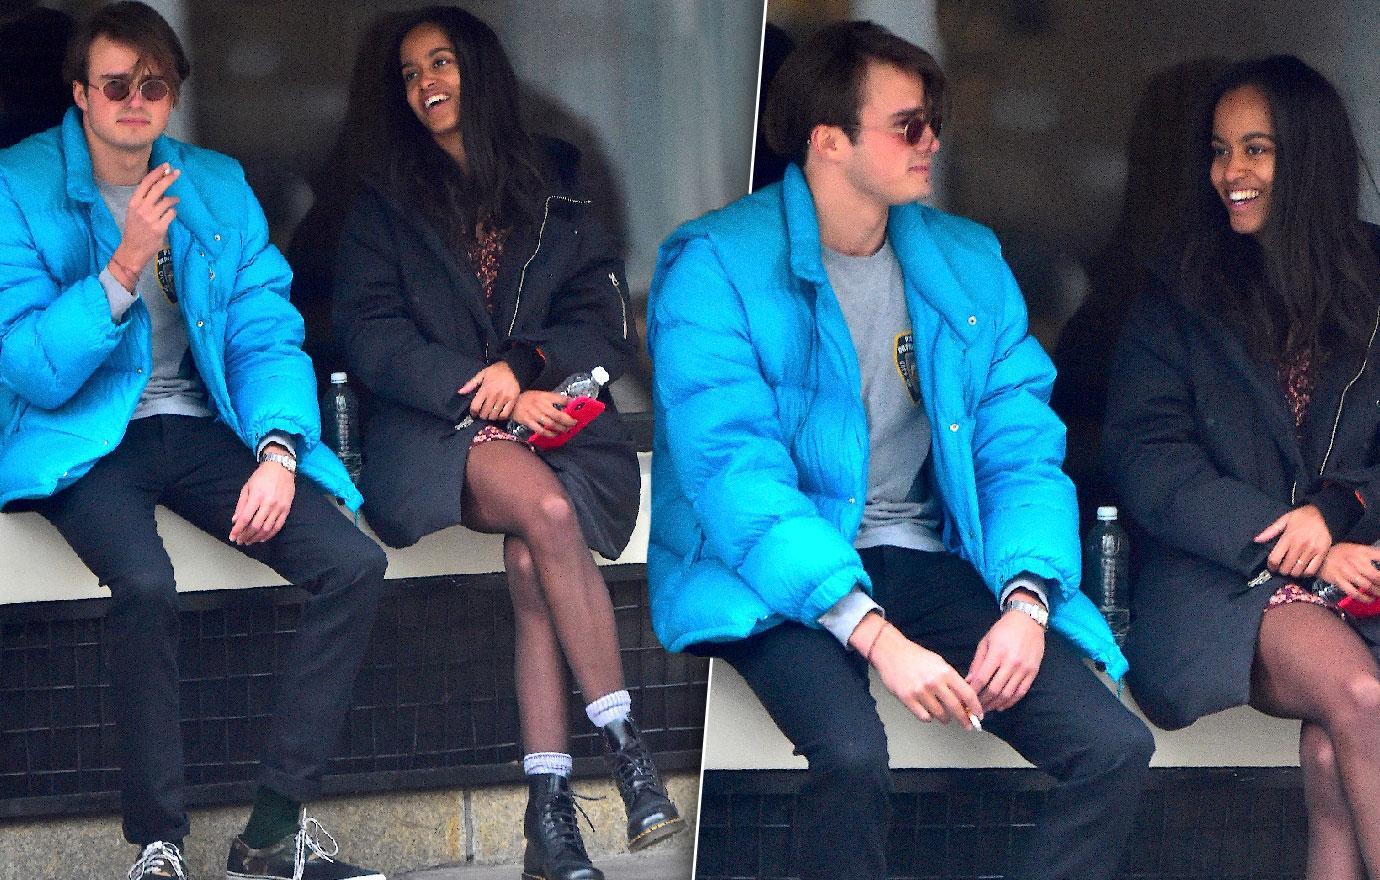 Malia Obama Hangs Out With British Boyfriend